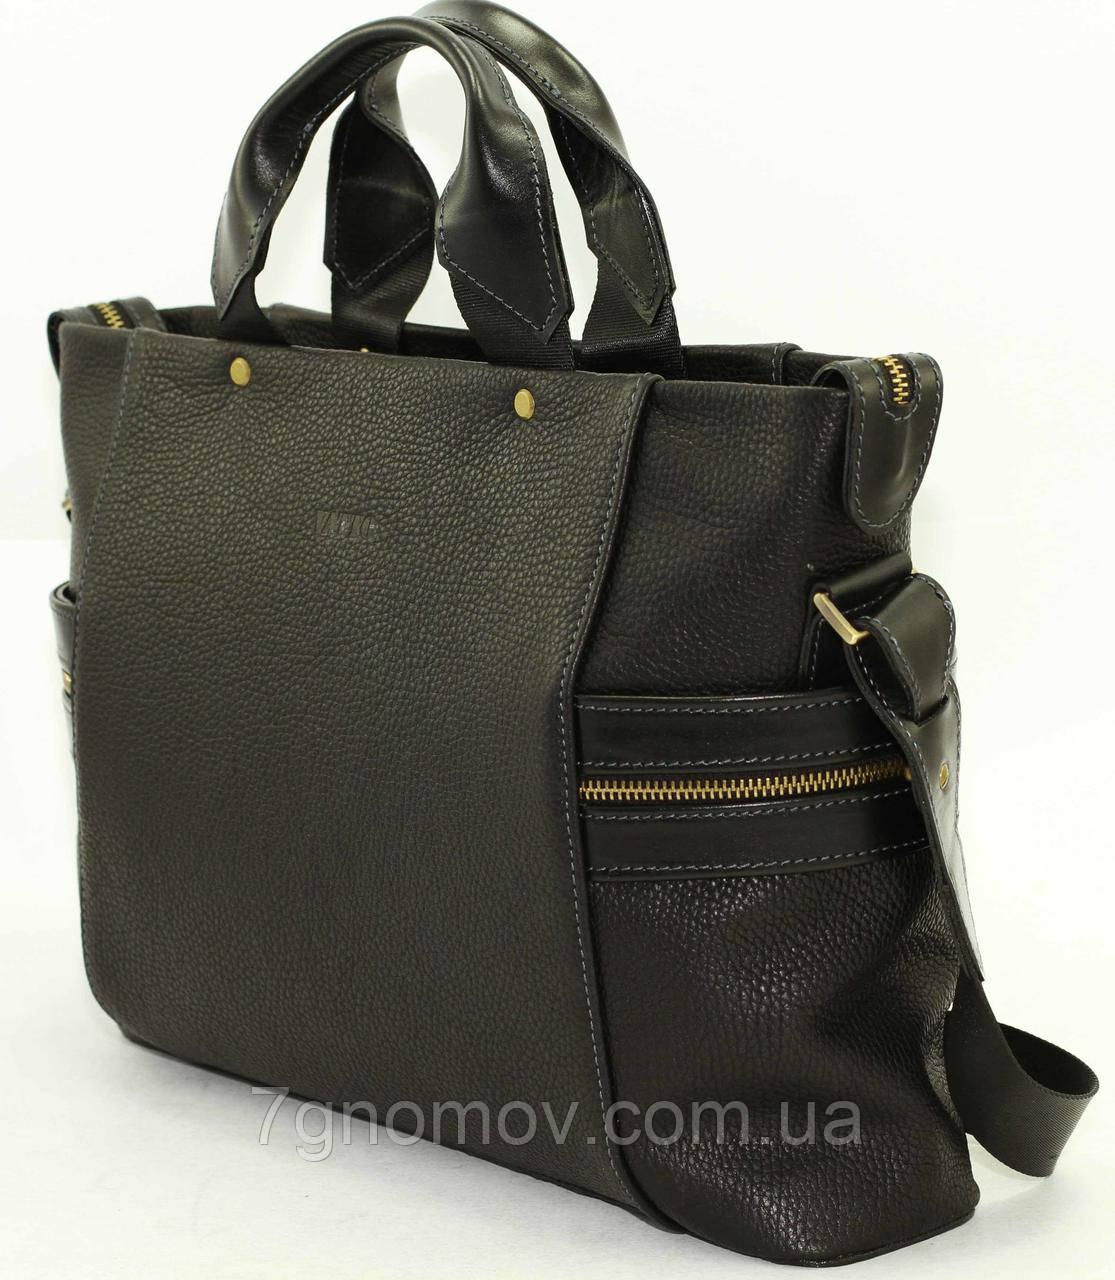 Мужская сумка VATTO Mk39.1 F8Kaz1